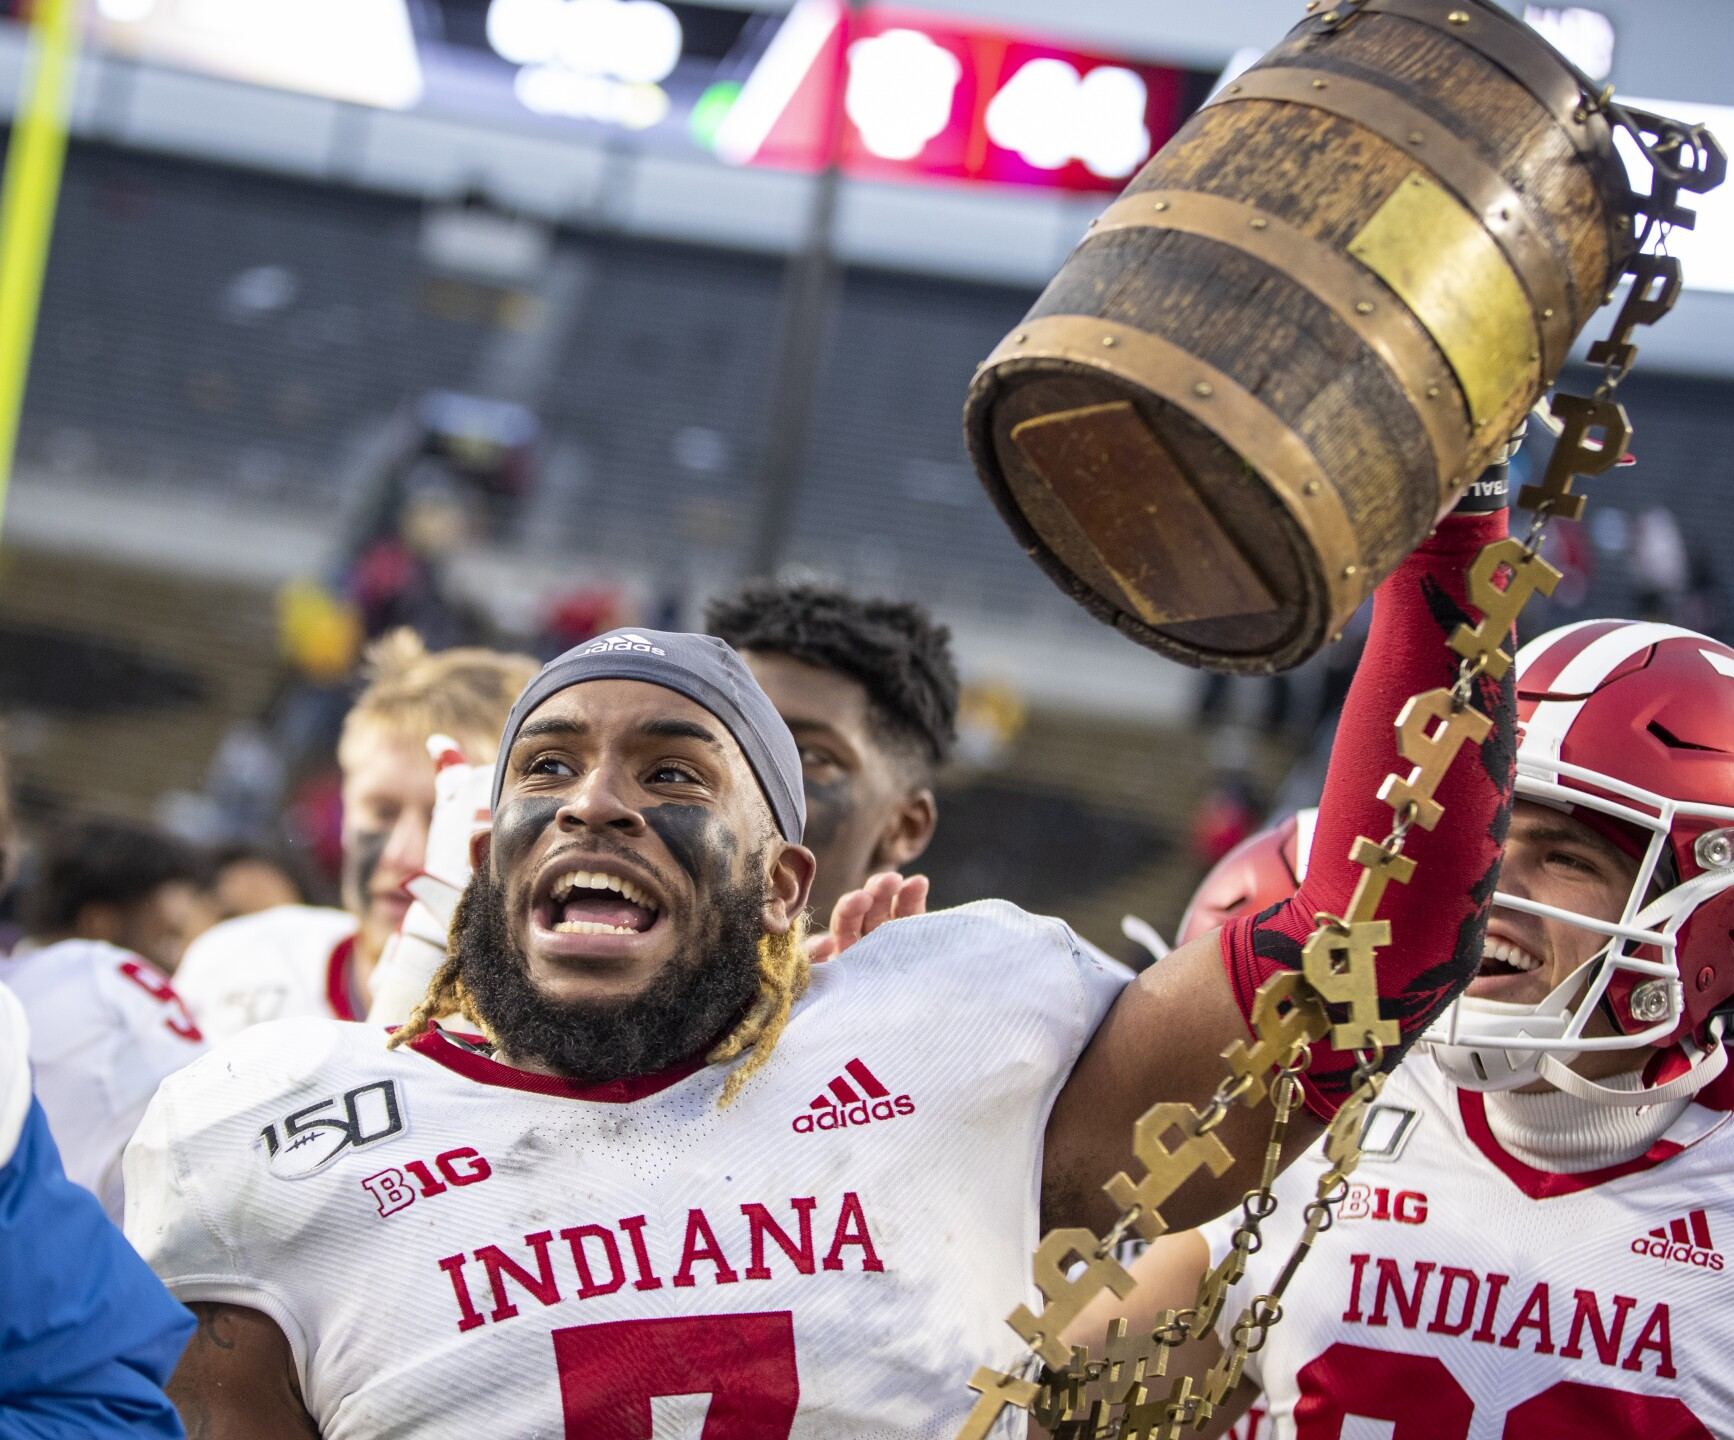 PHOTOS: IU vs. Purdue in the Bucket Game